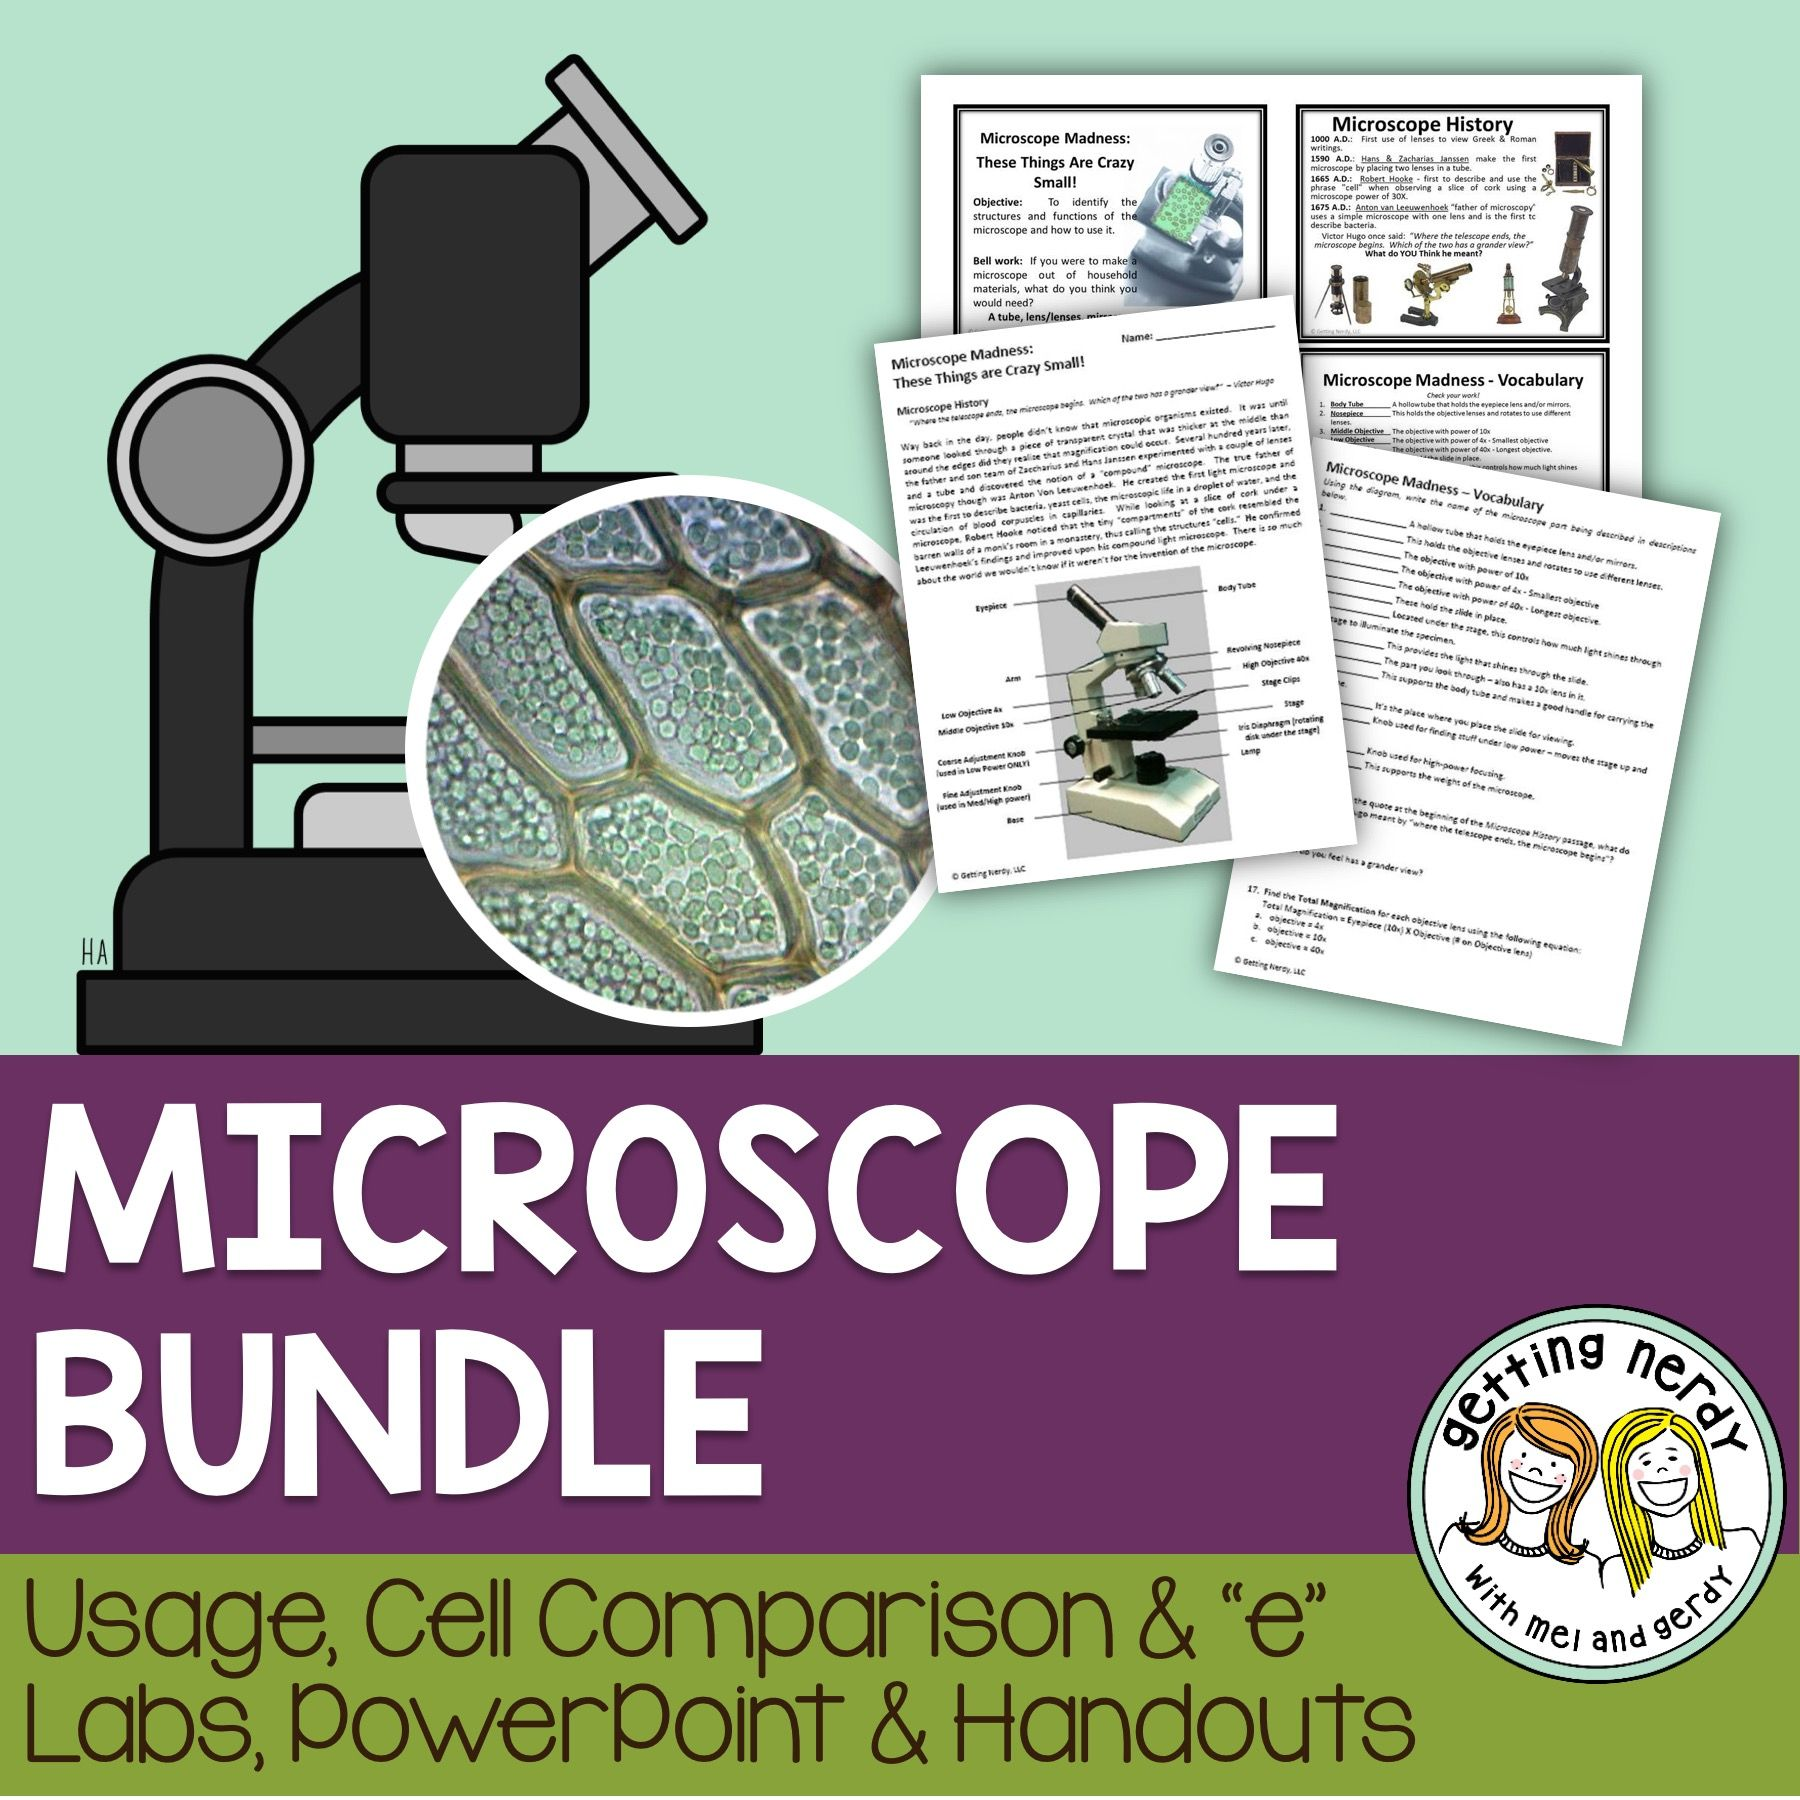 Microscope Introduction